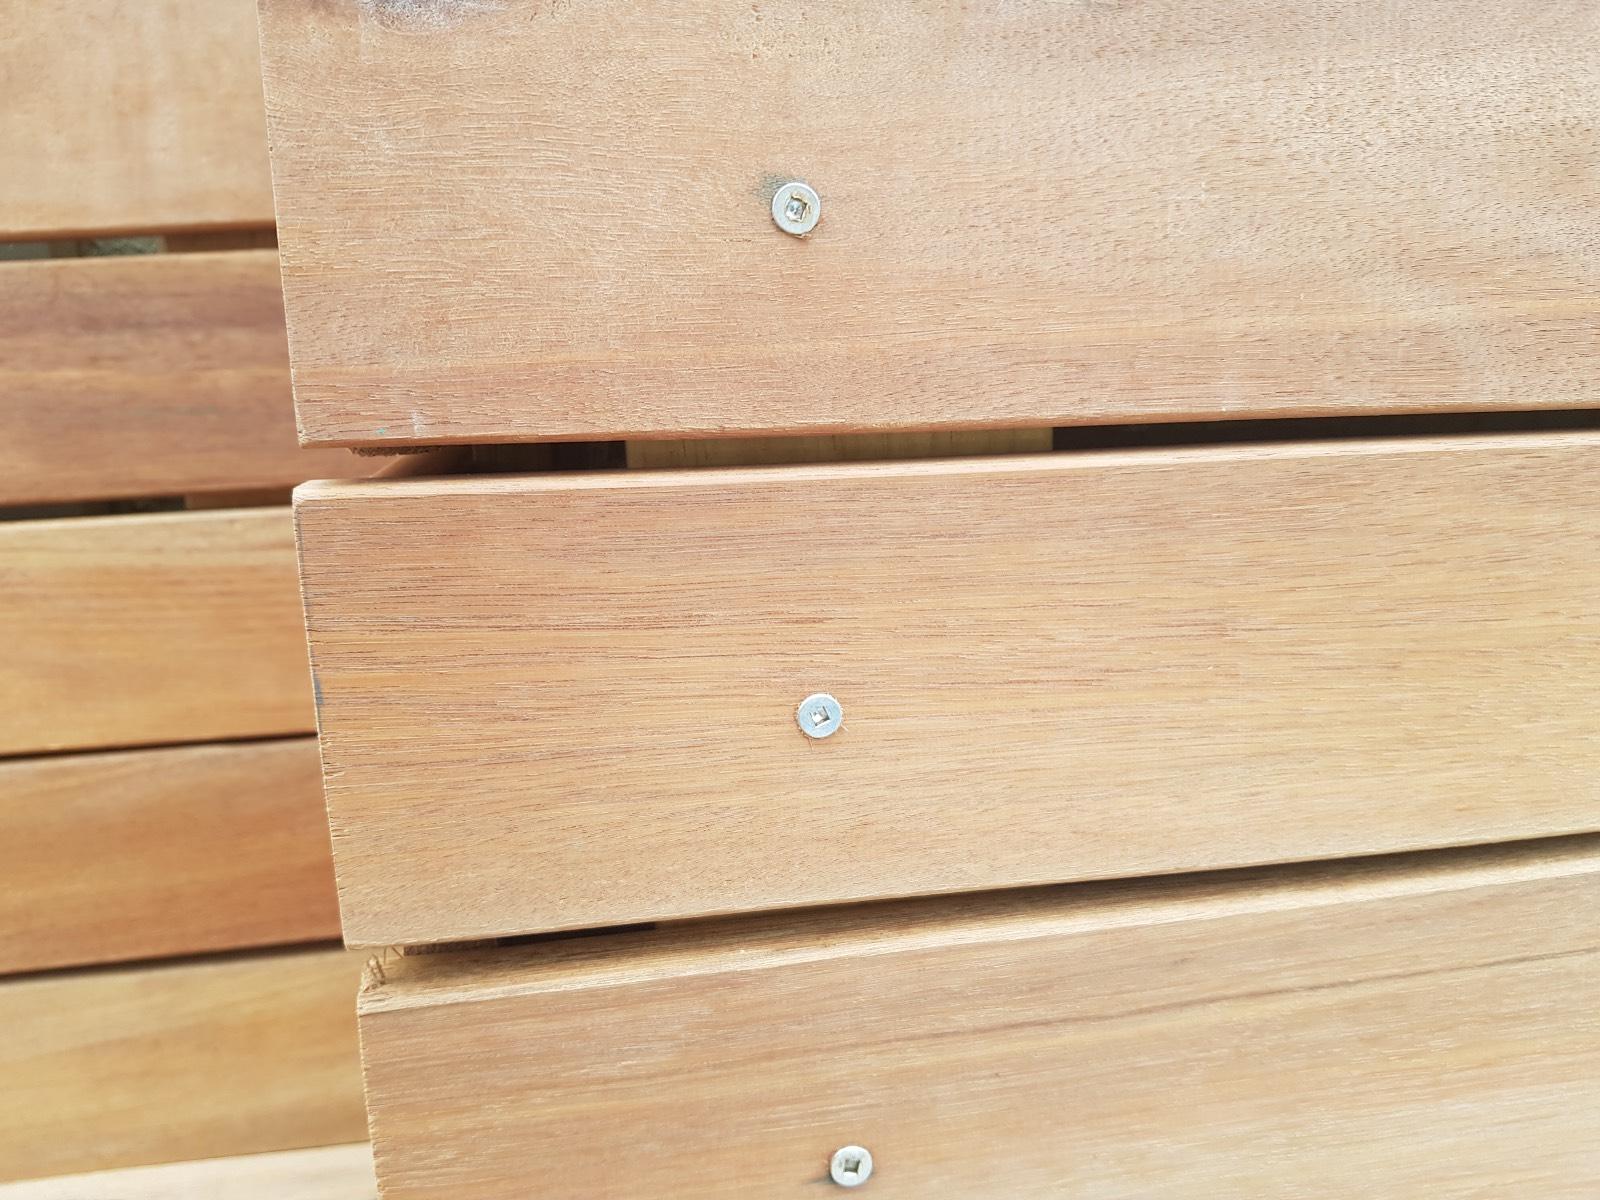 Wooden boards screwing standards